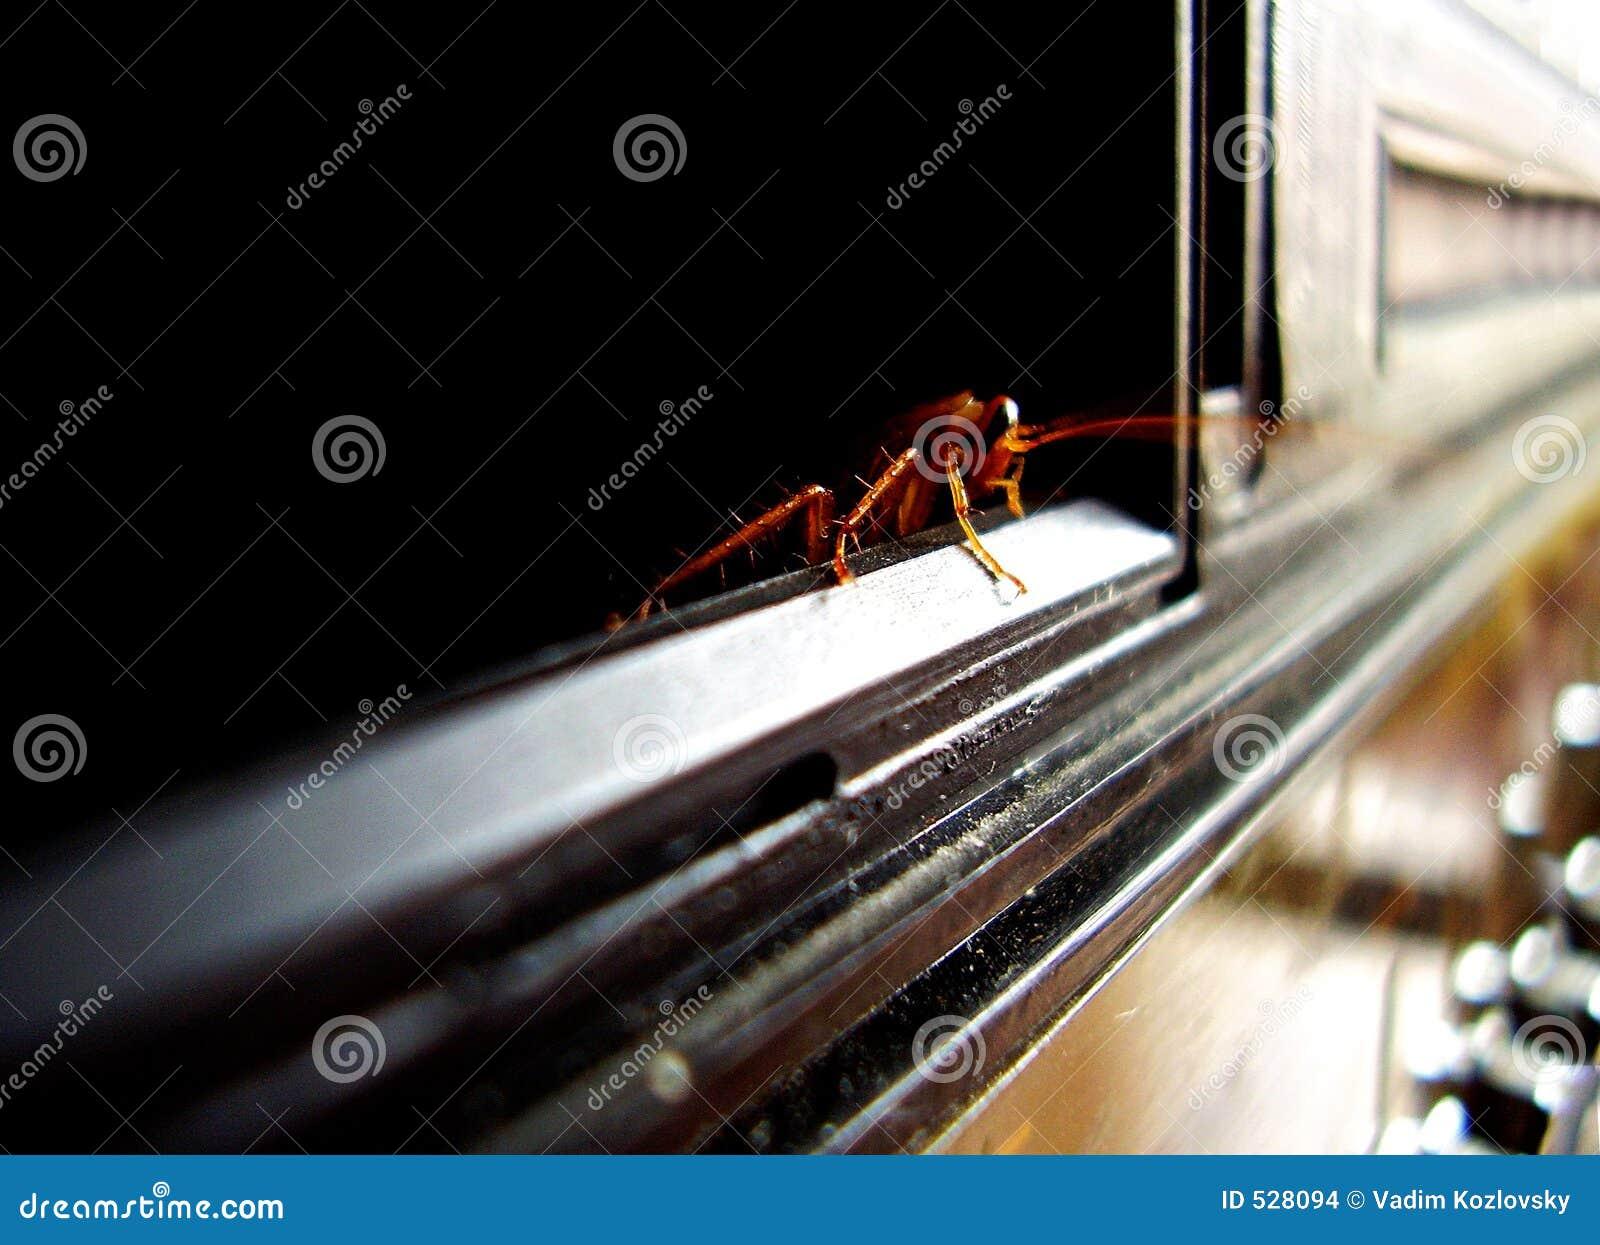 Download 蟑螂 库存照片. 图片 包括有 蟑螂, 恐怖, 污秽, 气味, 昆虫, 天线, 污染, 本质 - 528094